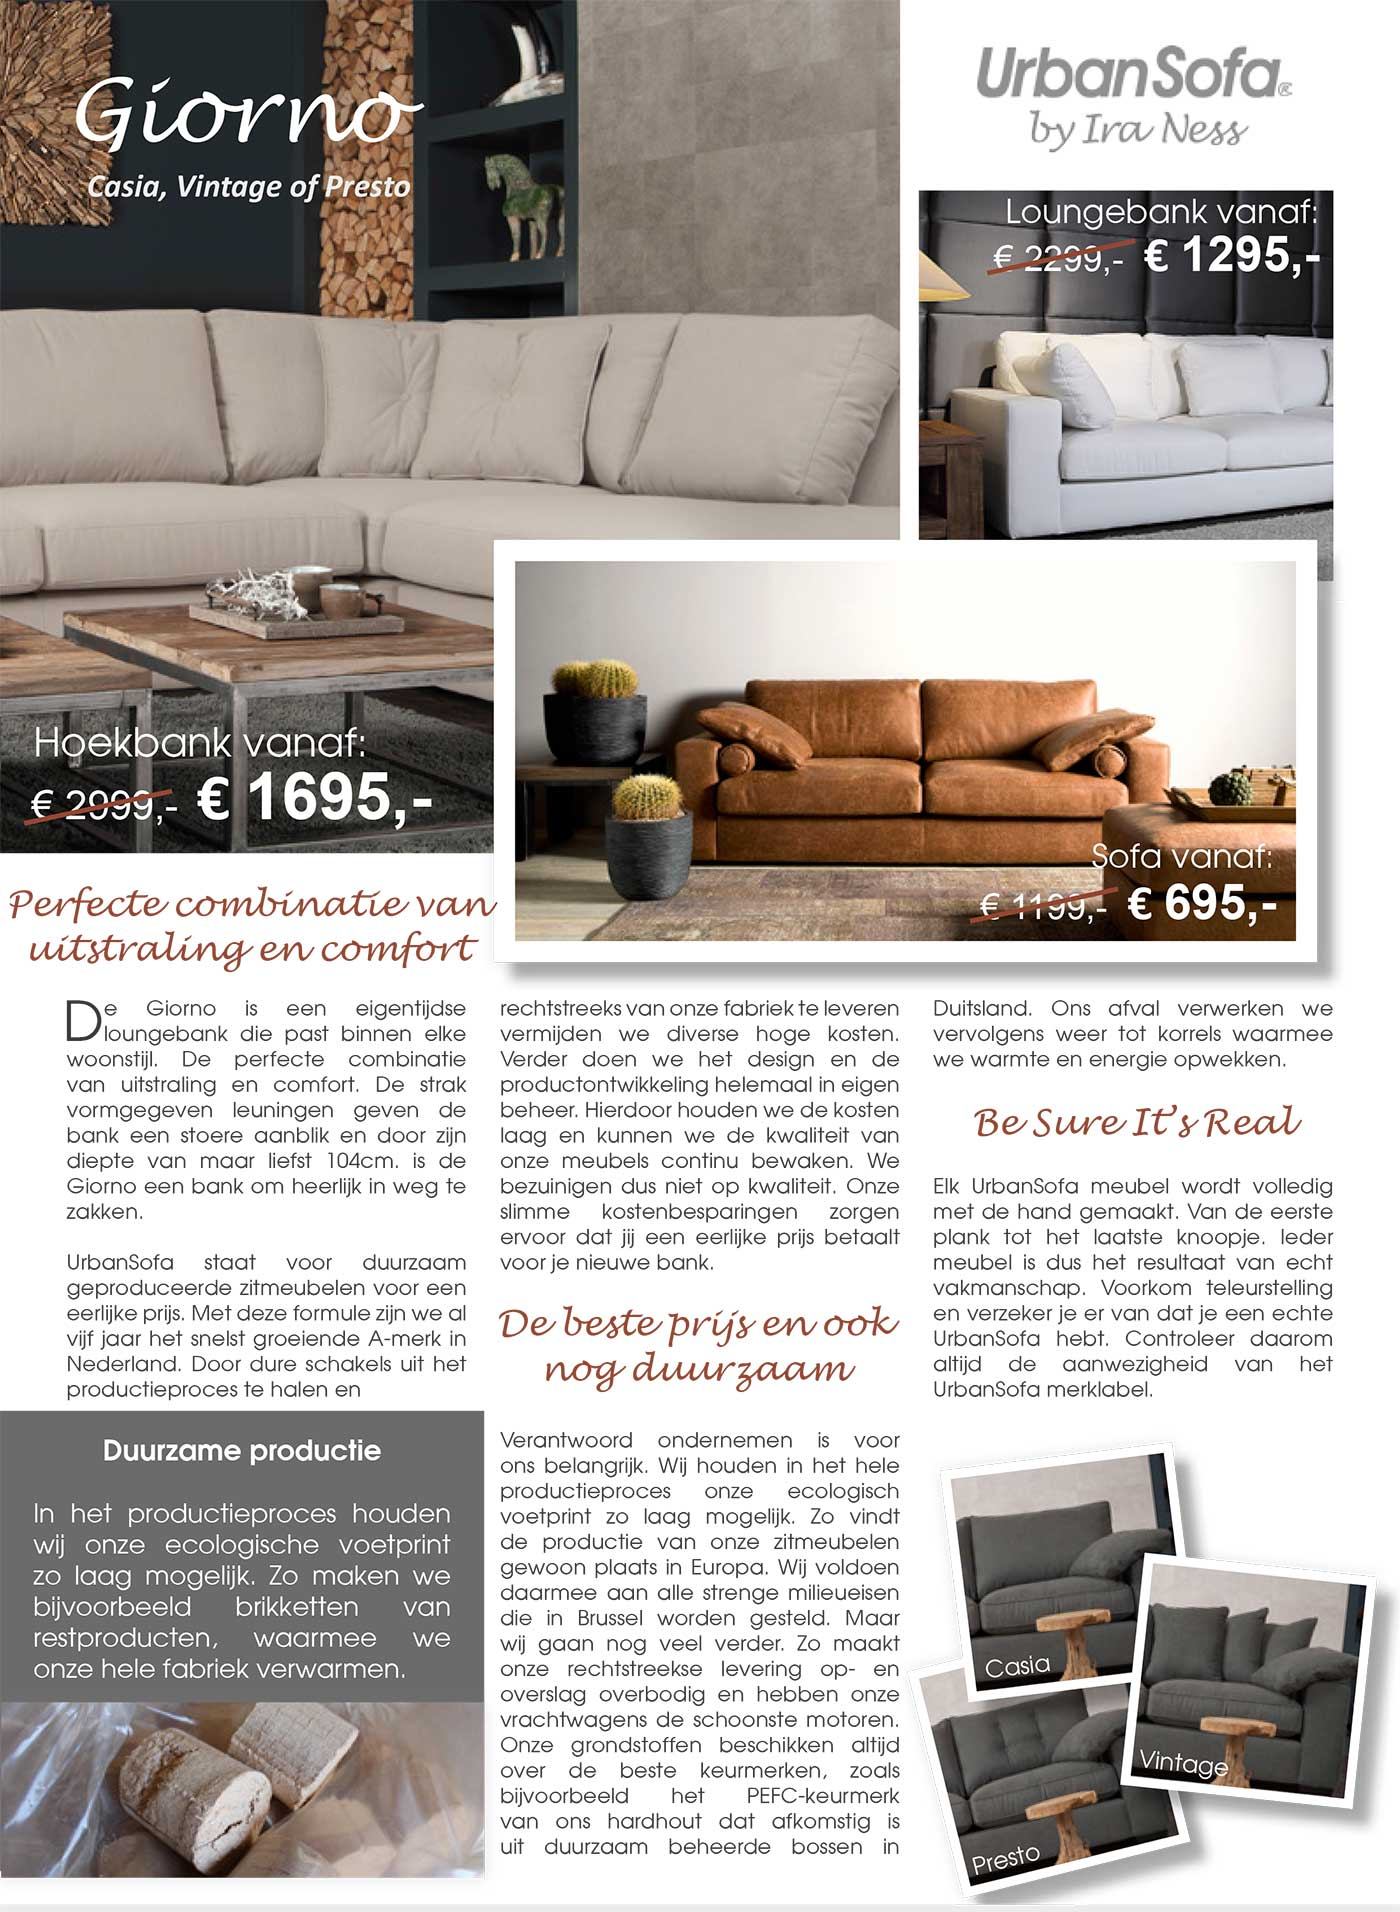 UrbanSofa_Giorno_Sofa_Loungebank_Hoekbank-1